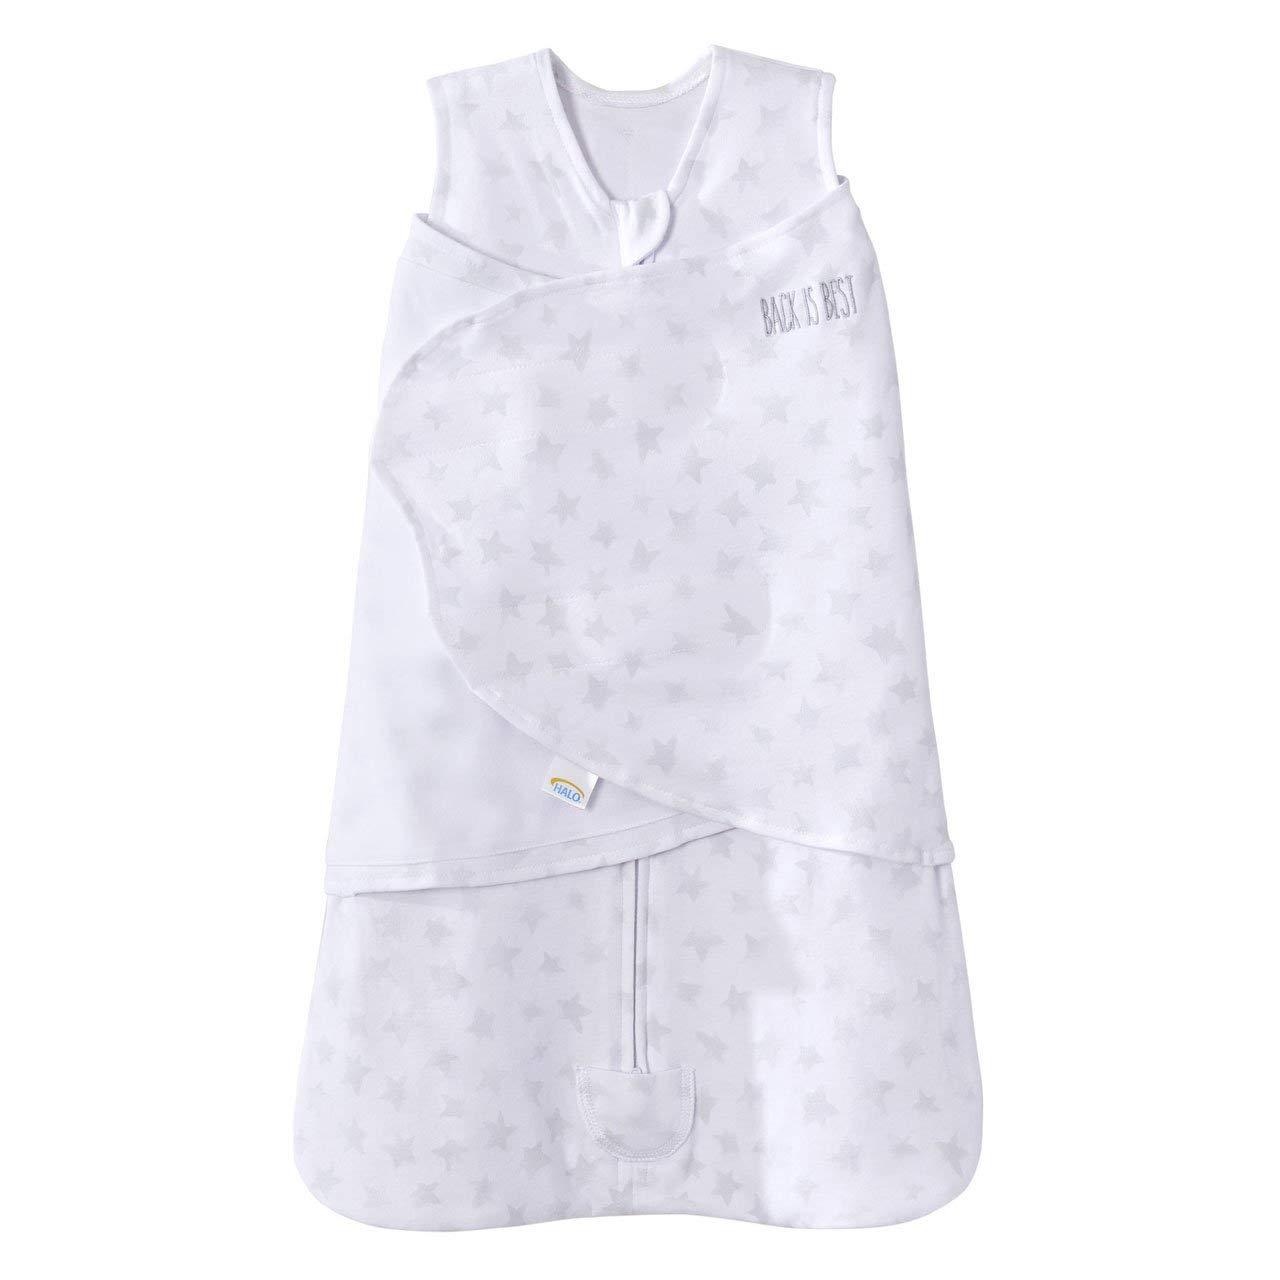 100% Cotton SleepSack Swaddle Platinum Series, Pale Grey Twinkle, Small